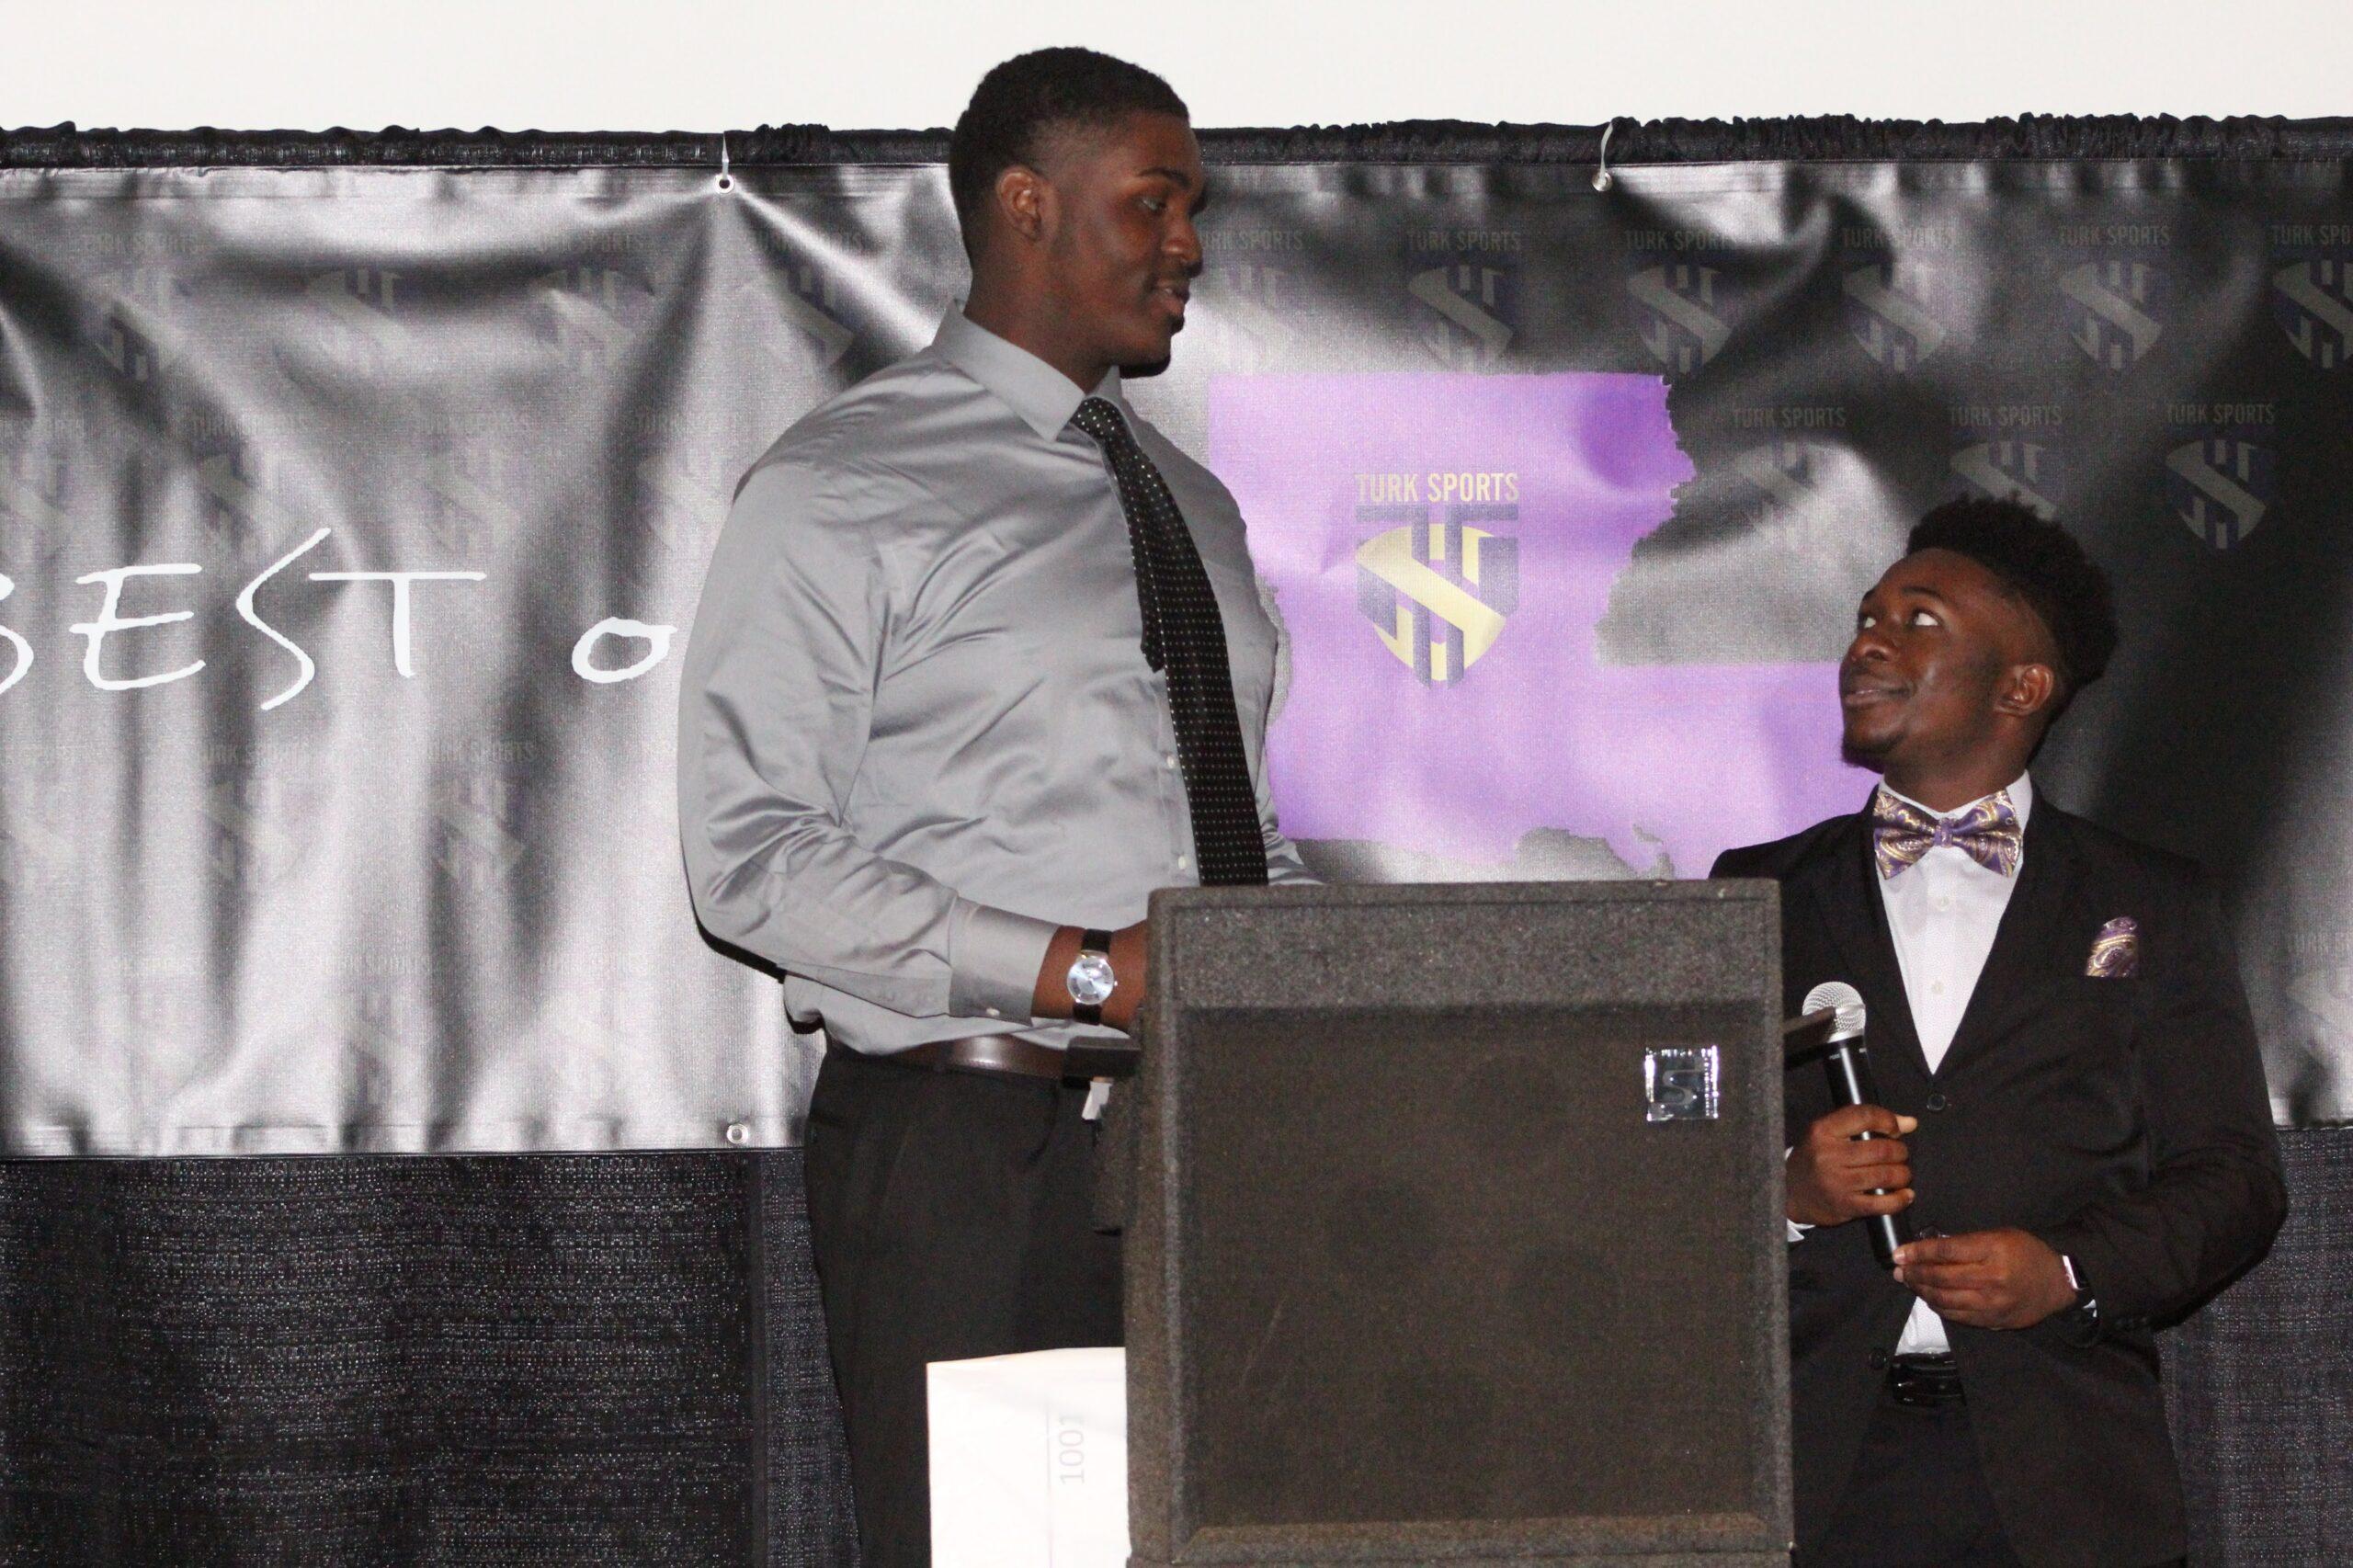 Kaleb Etienne & Lance Jones share a height joke